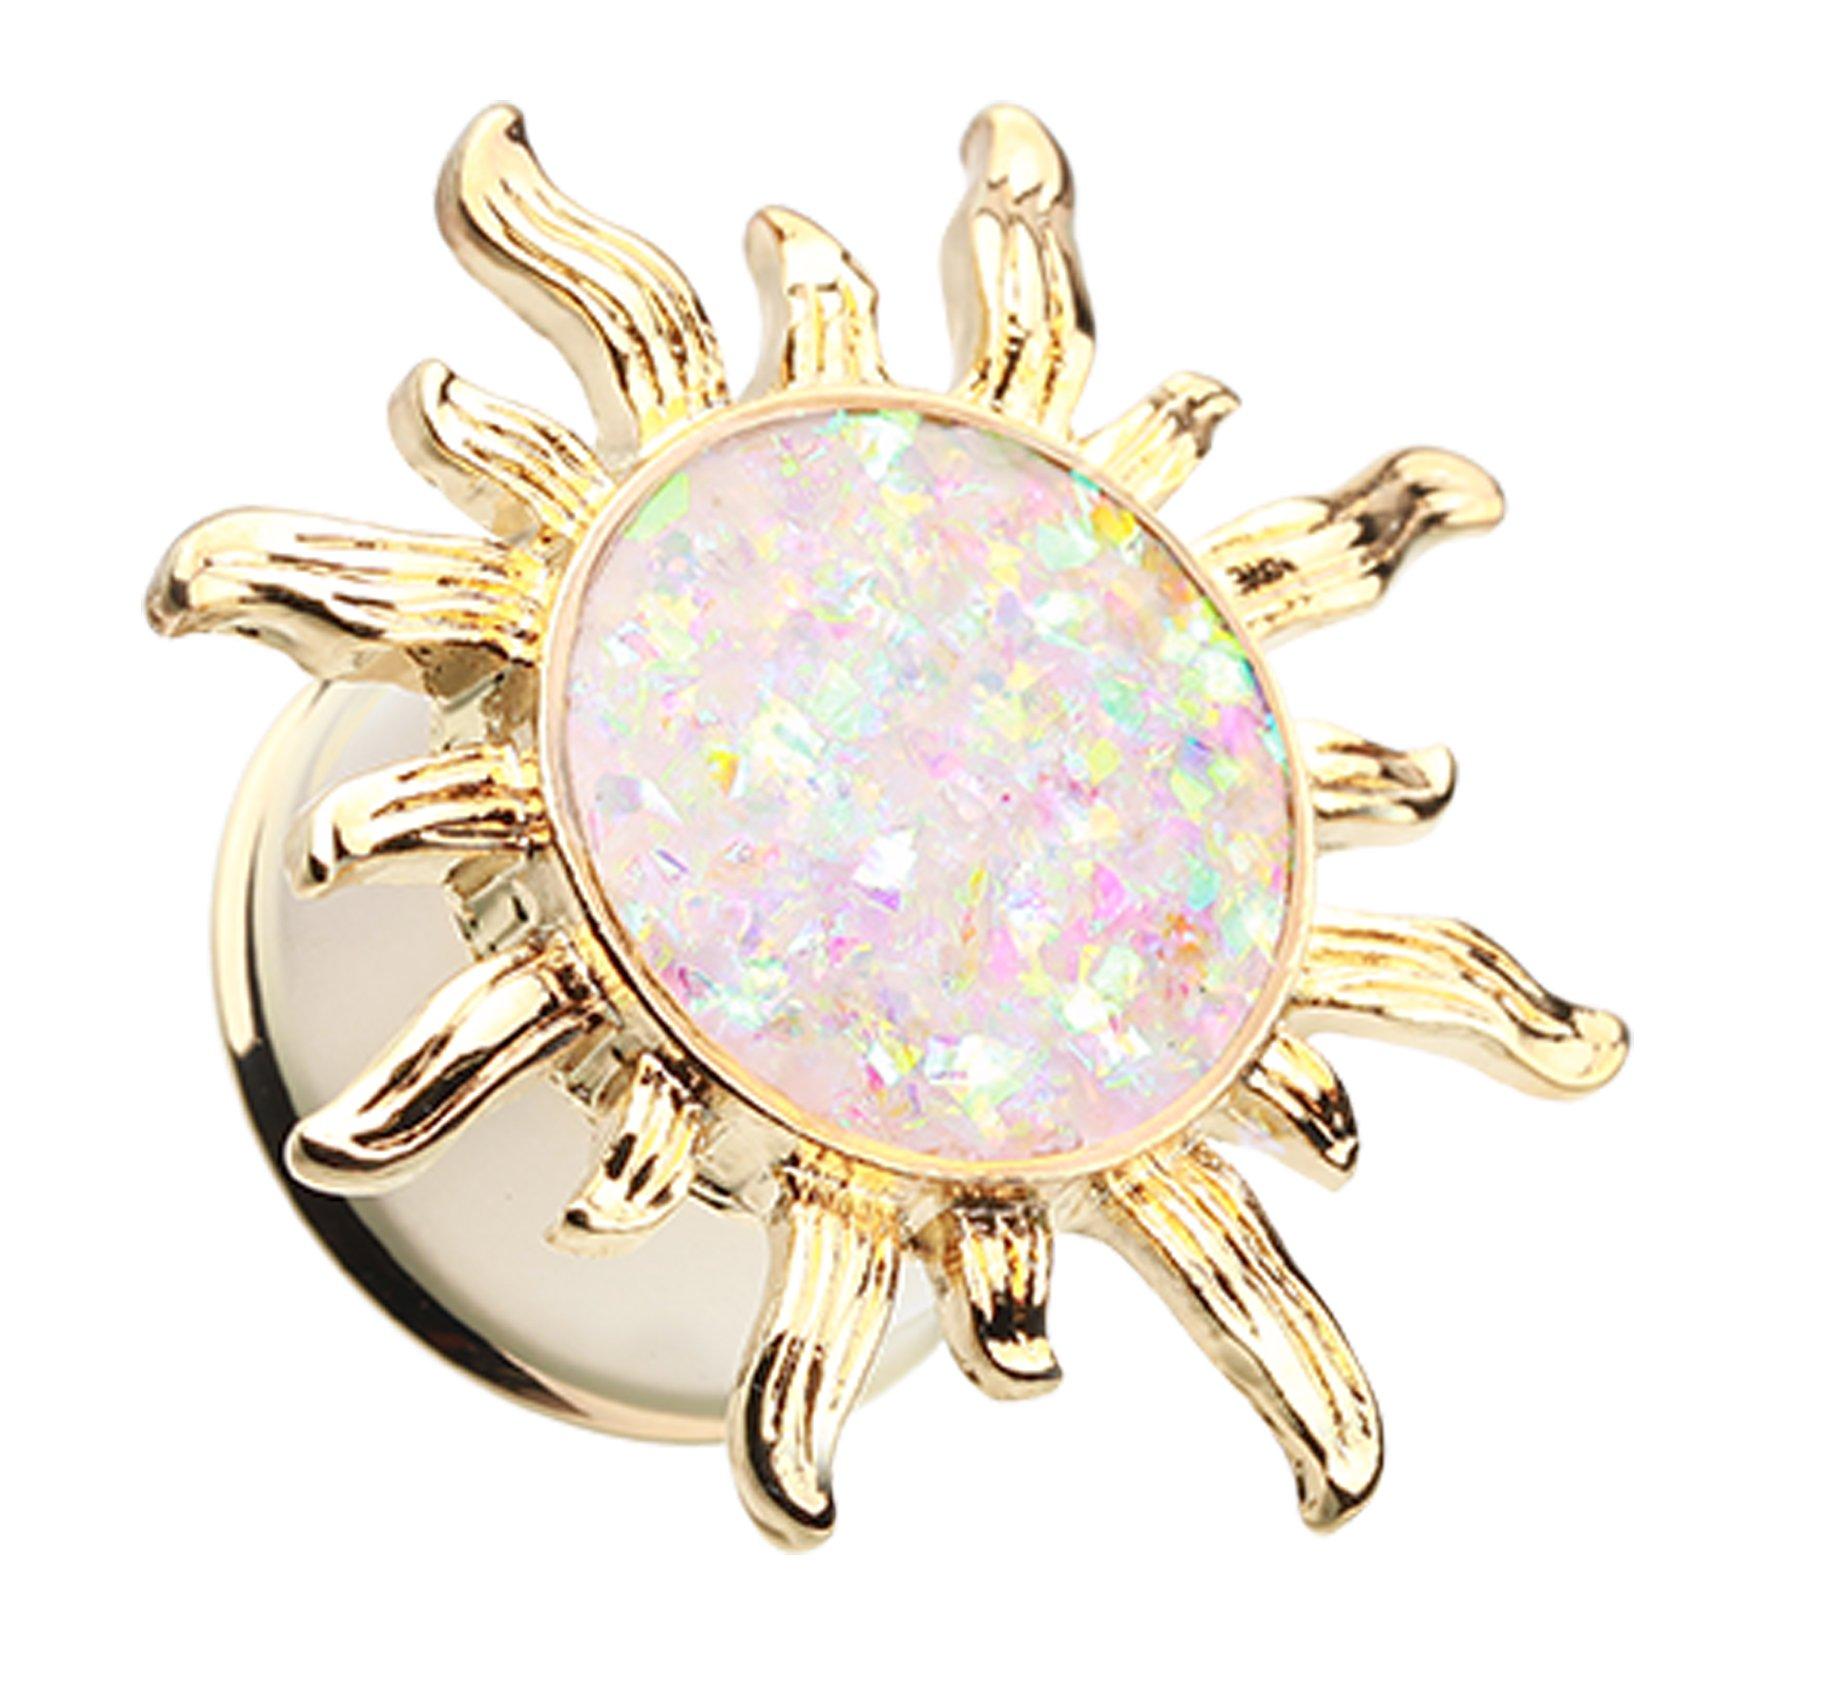 Golden Colored Blazing Sun Opalescent Glitter Ear Gauge Plug - 7/16'' (11mm) - Aurora Borealis - Sold as a Pair